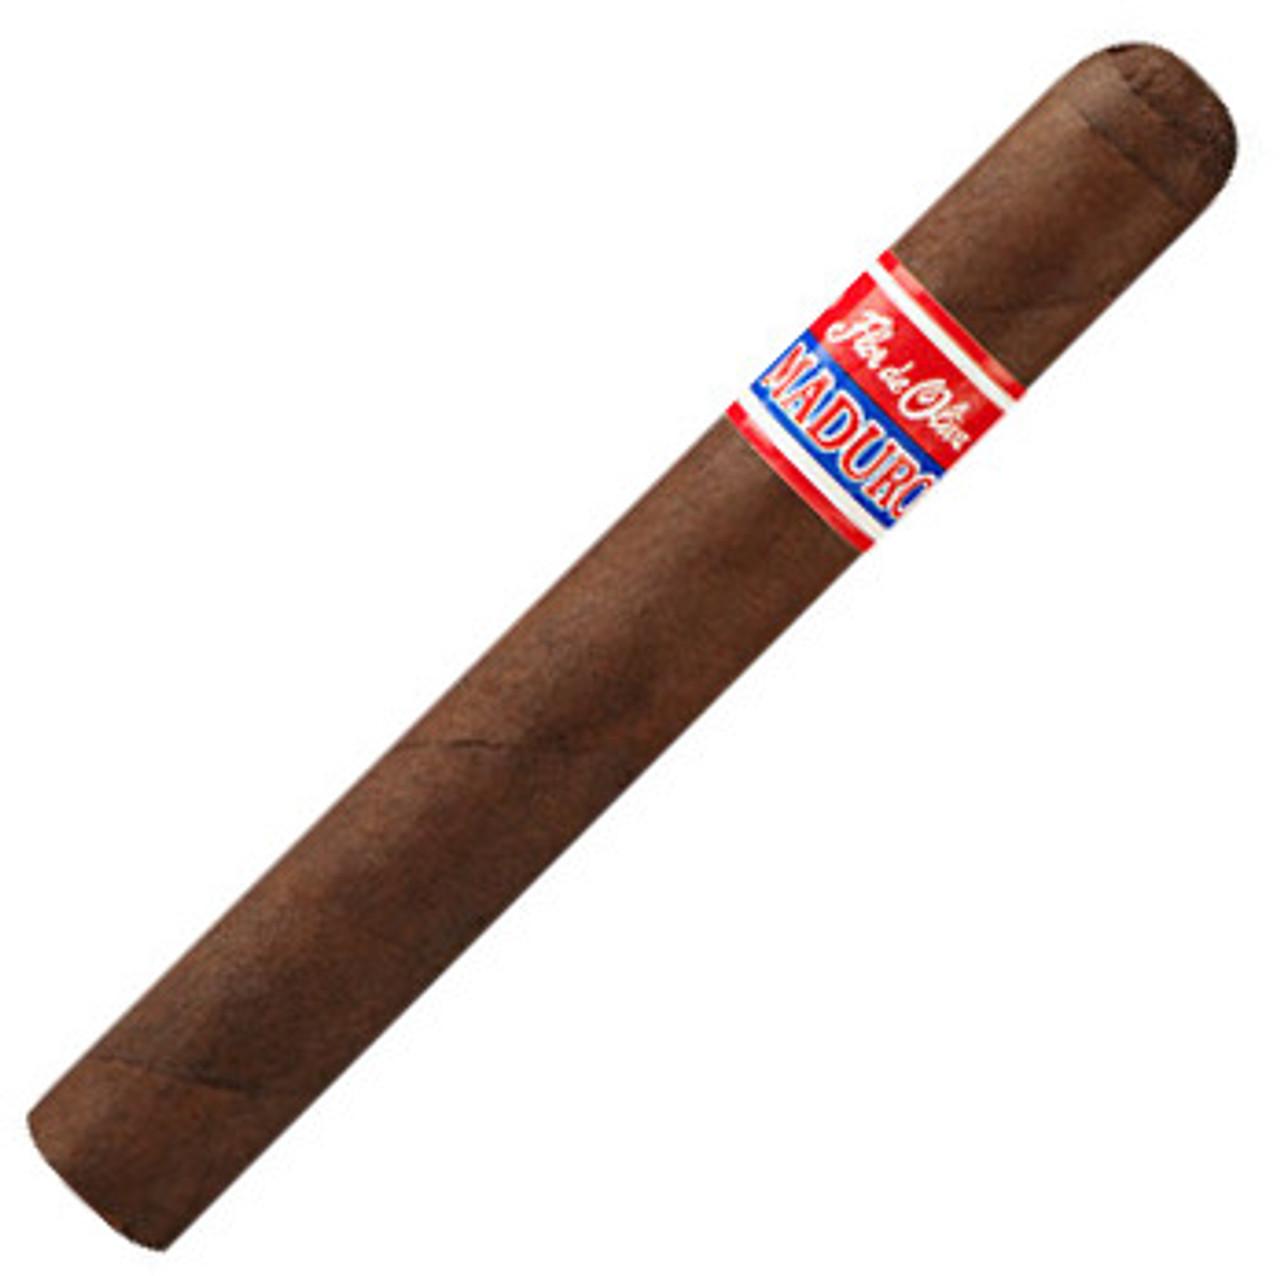 Flor de Oliva Maduro Toro Cigars - 6 x 50 (Box of 20)